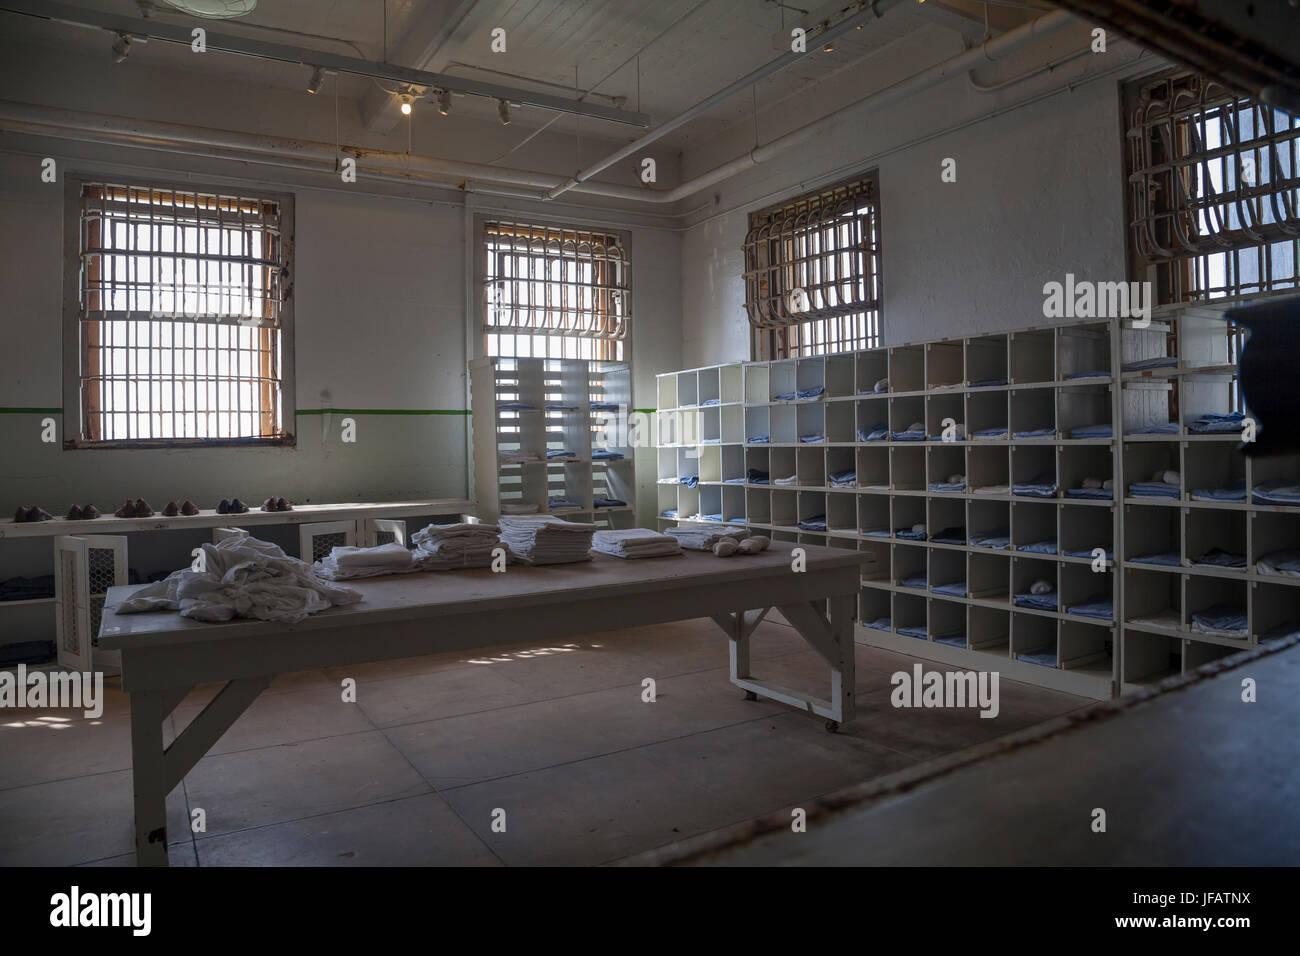 Laundry room in Alcatraz penitentiary, San Francisco, California, USA - Stock Image